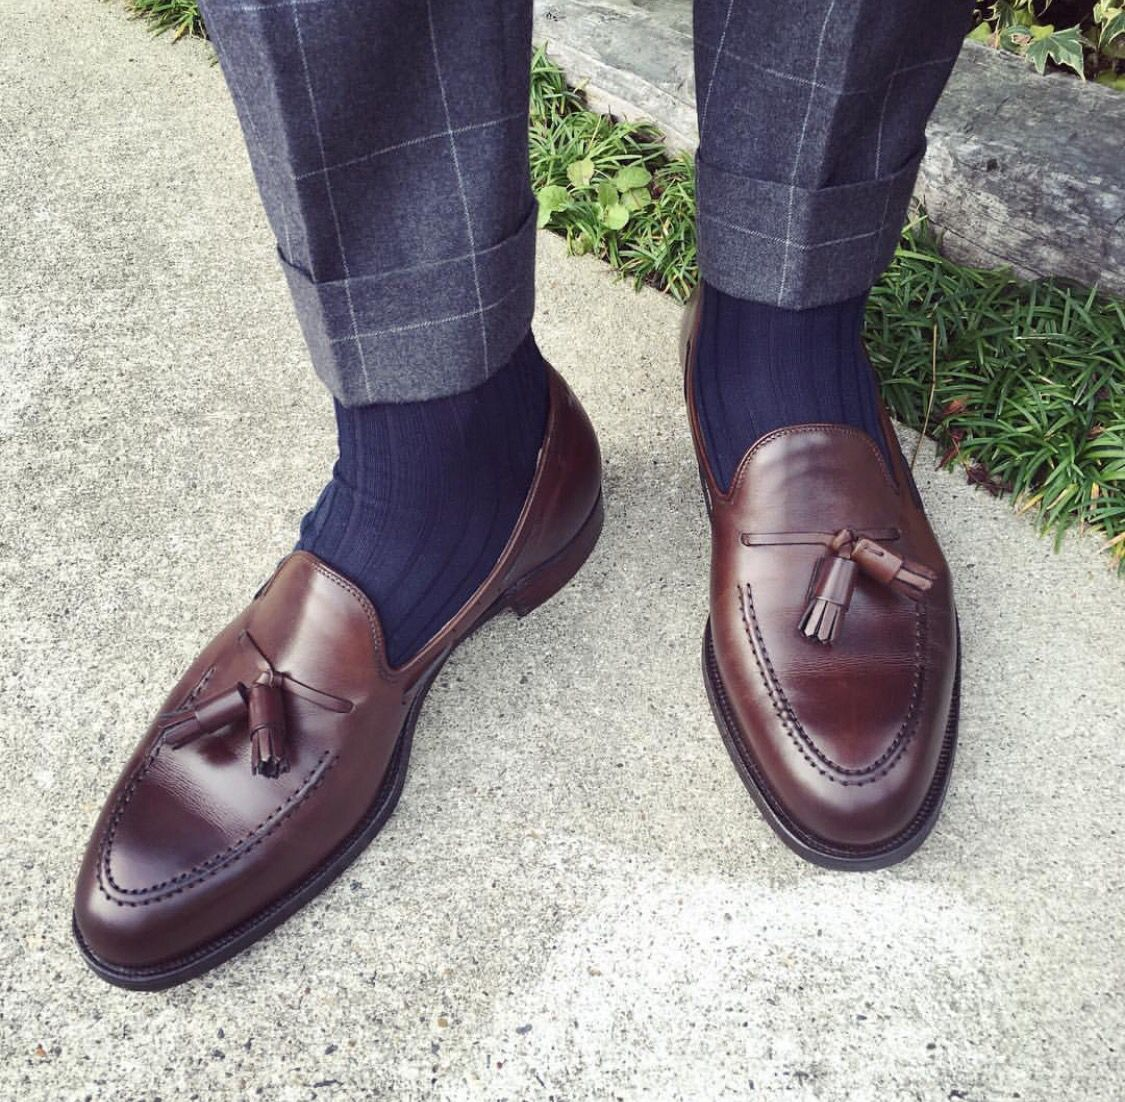 d5ccf34a97f5 Brown tassel Loafers   Gentleman s clothes   Pinterest ...